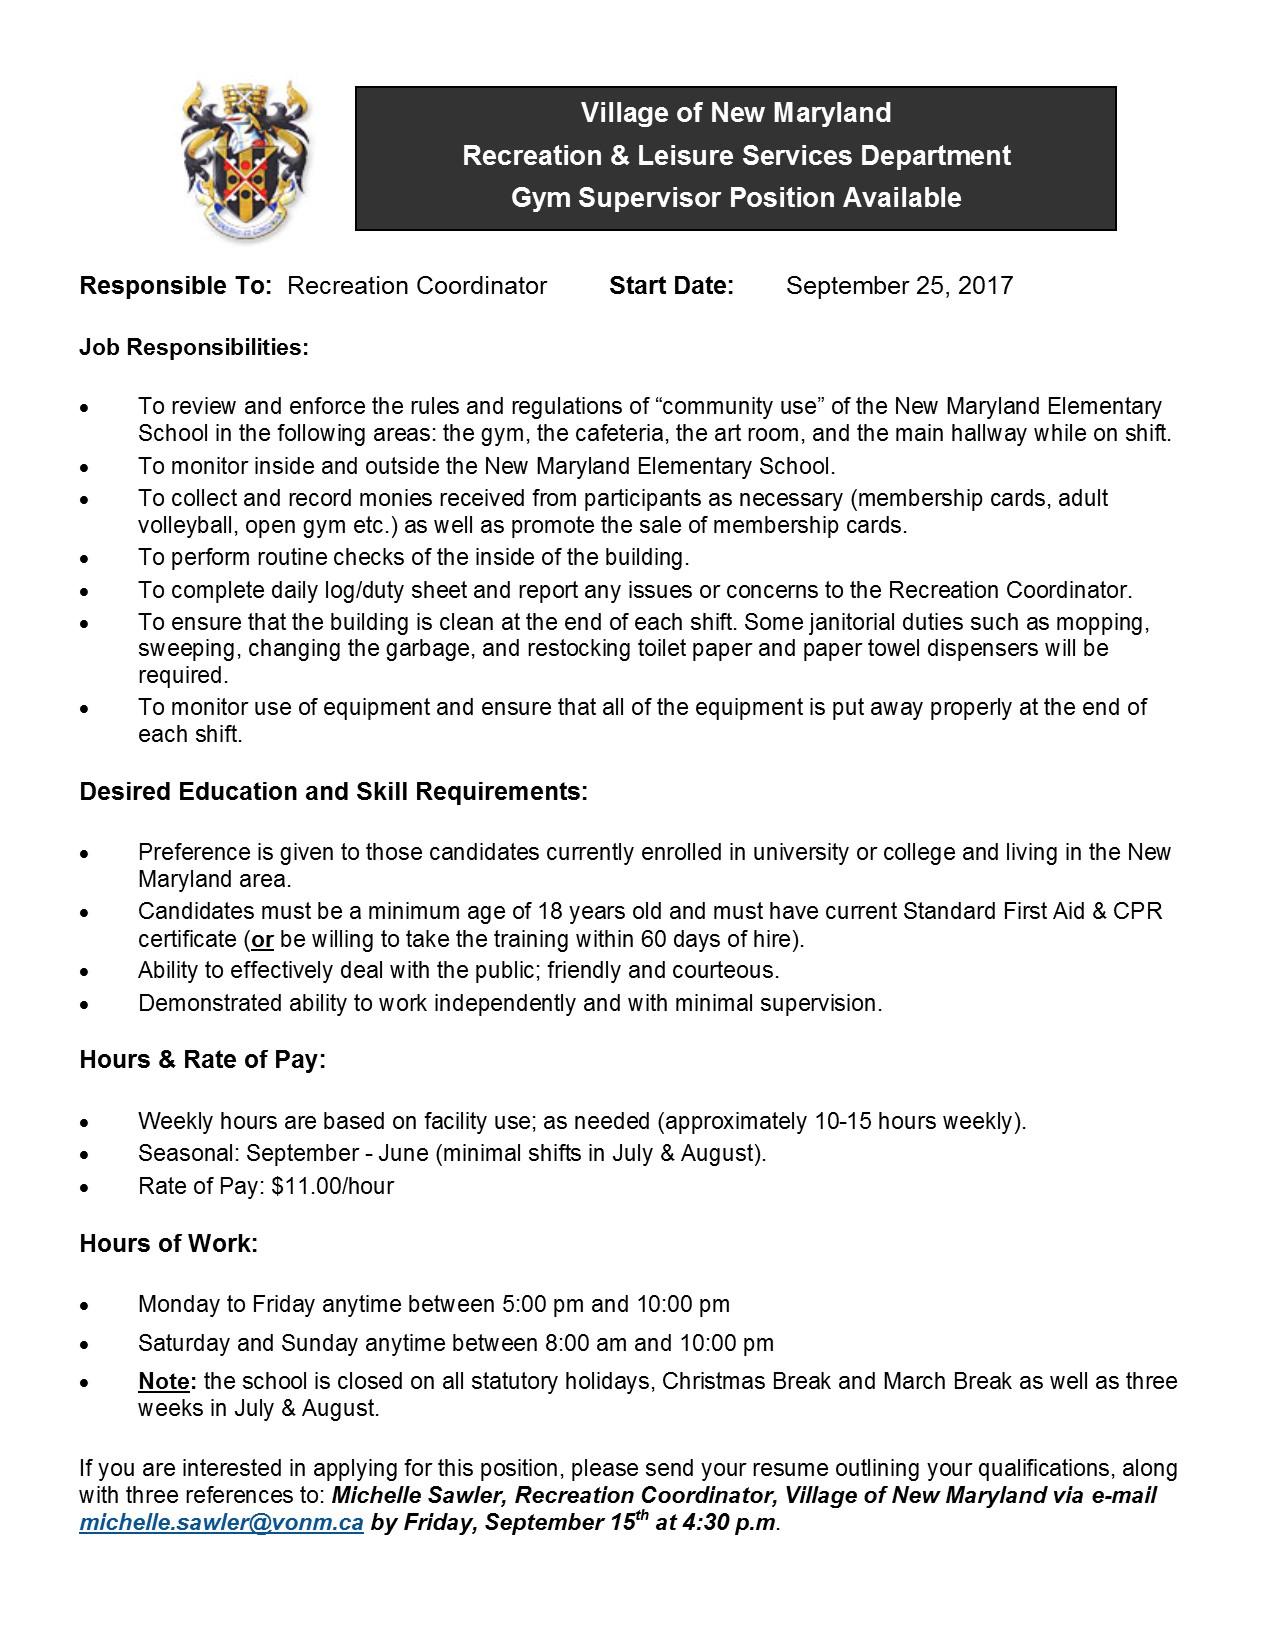 100 Sales Coordinator Job Description Application Letter